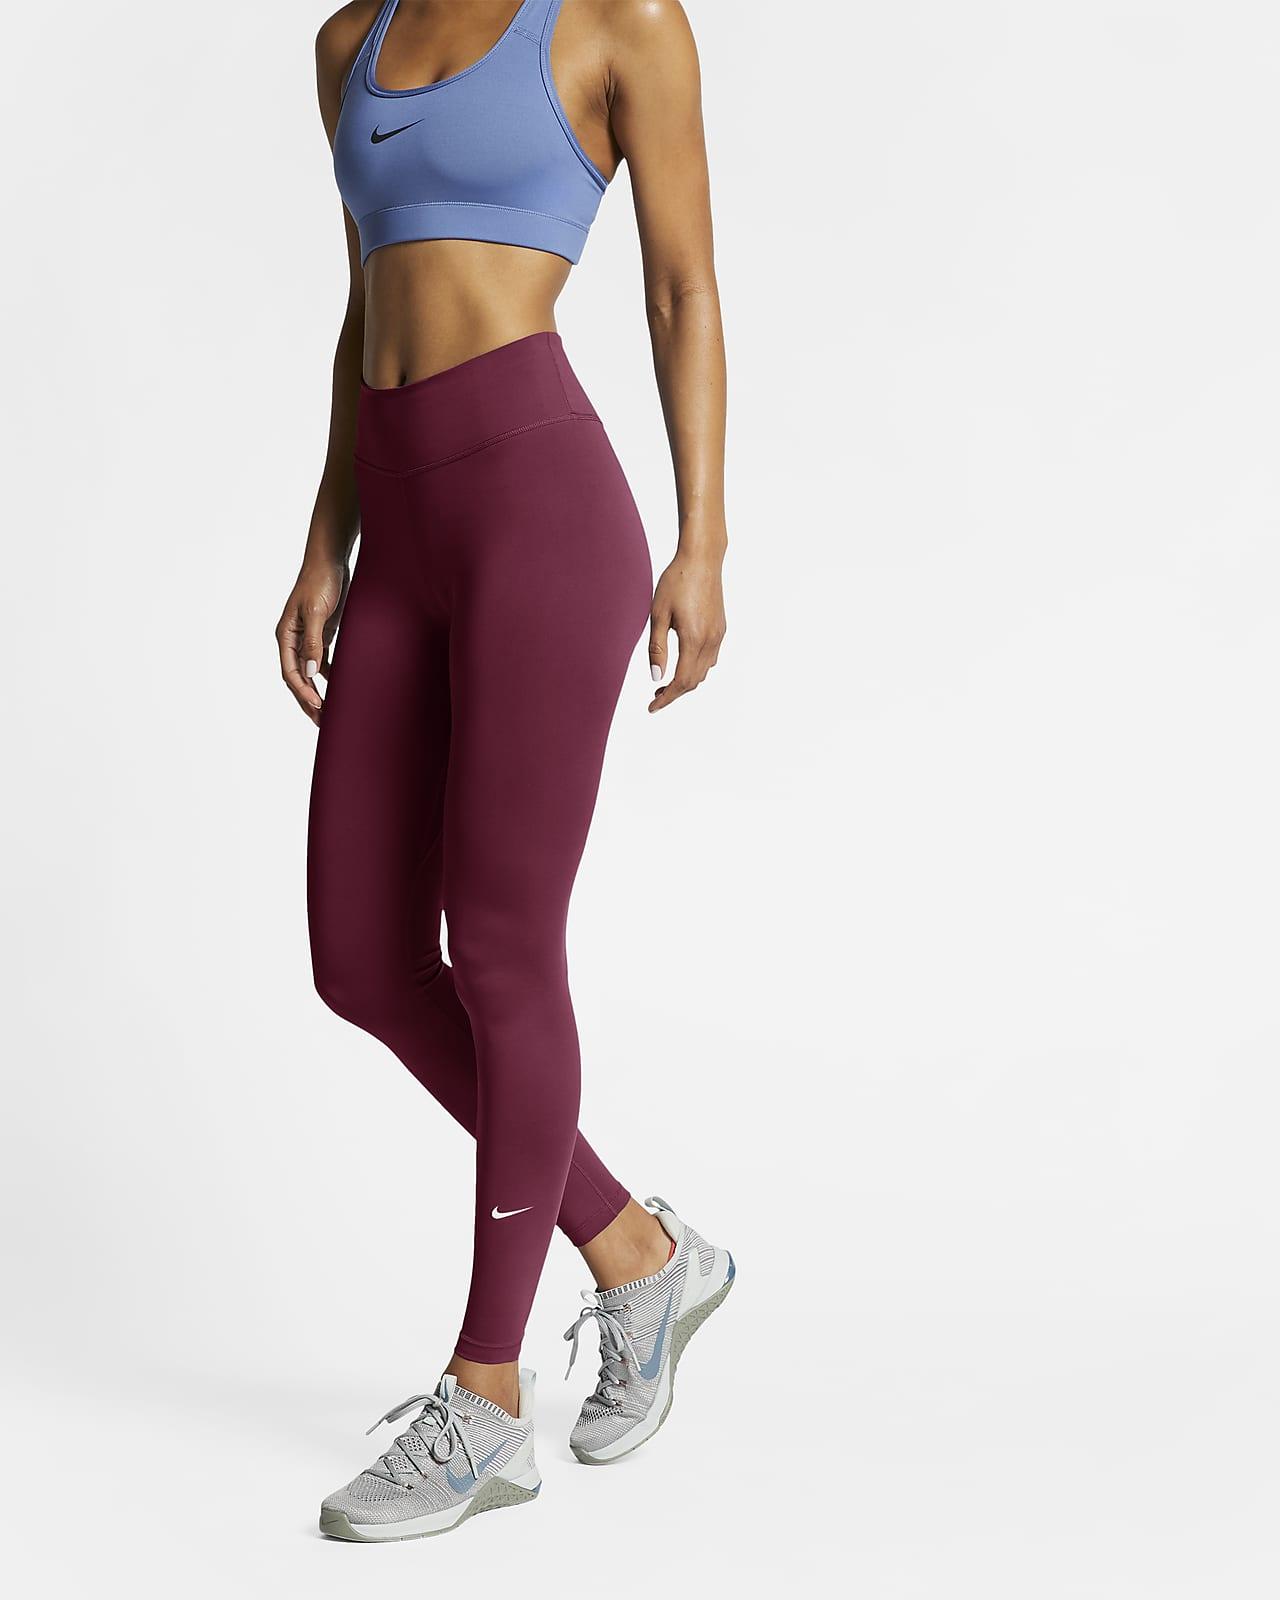 Nike One 女款緊身褲